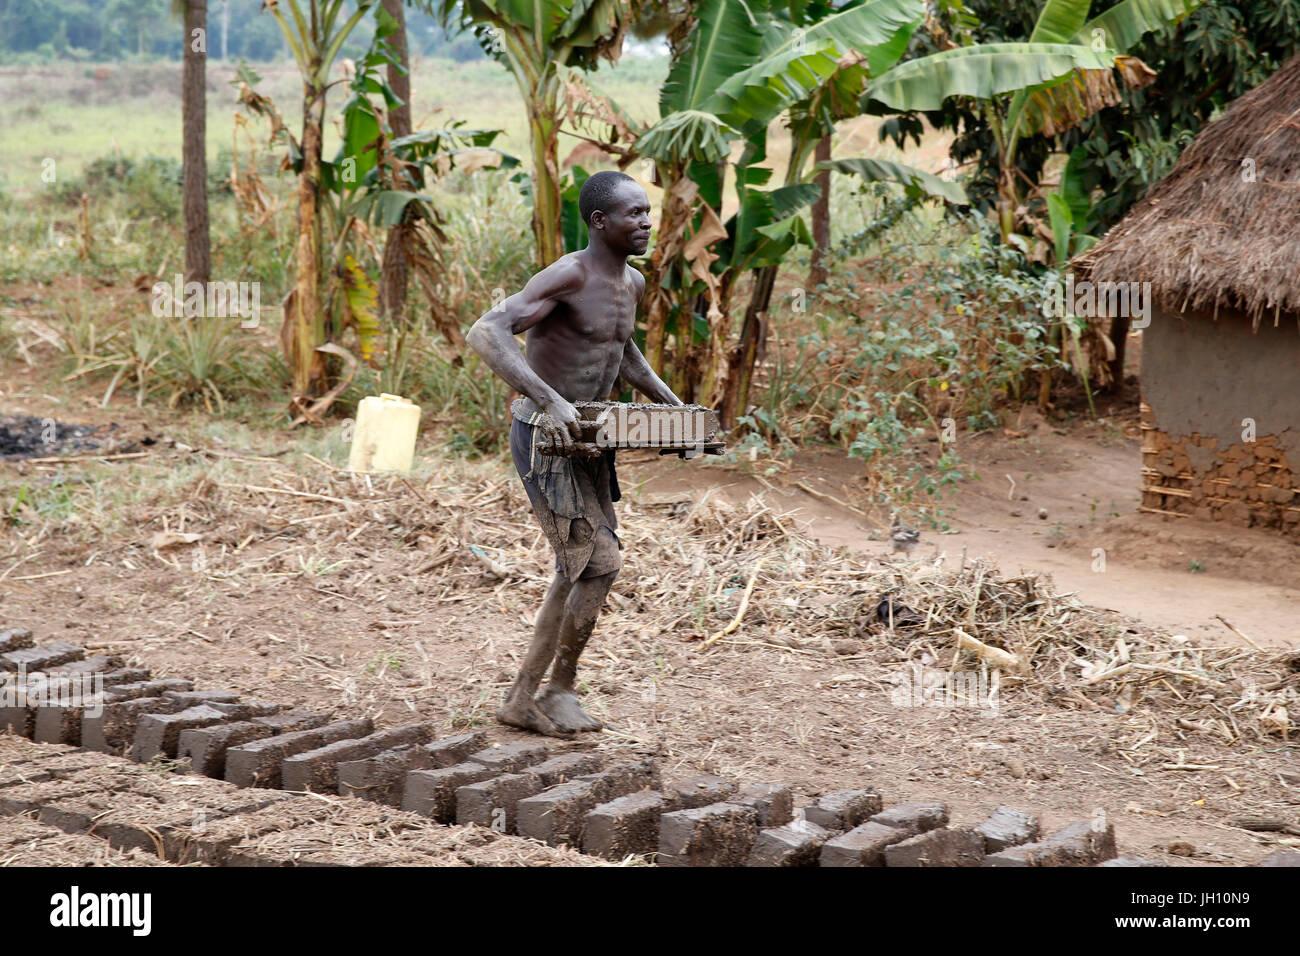 Fabbrica di mattoni. Uganda. Immagini Stock